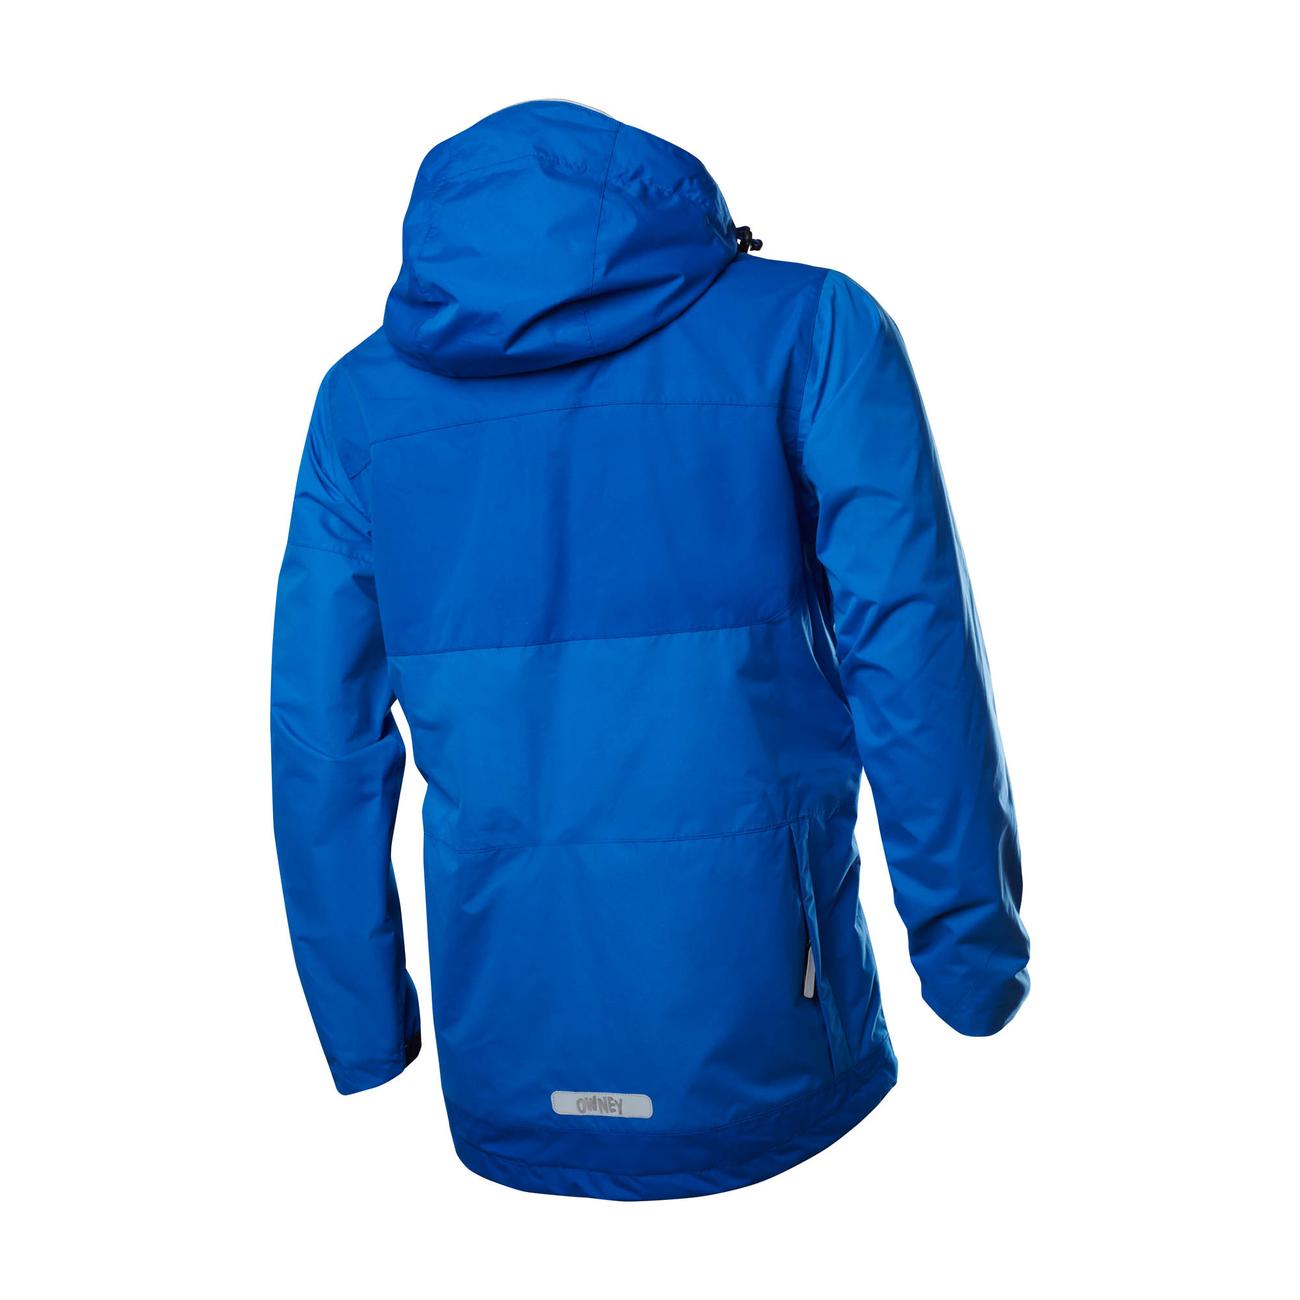 Owney Nova Jacket für Männer Bild 2